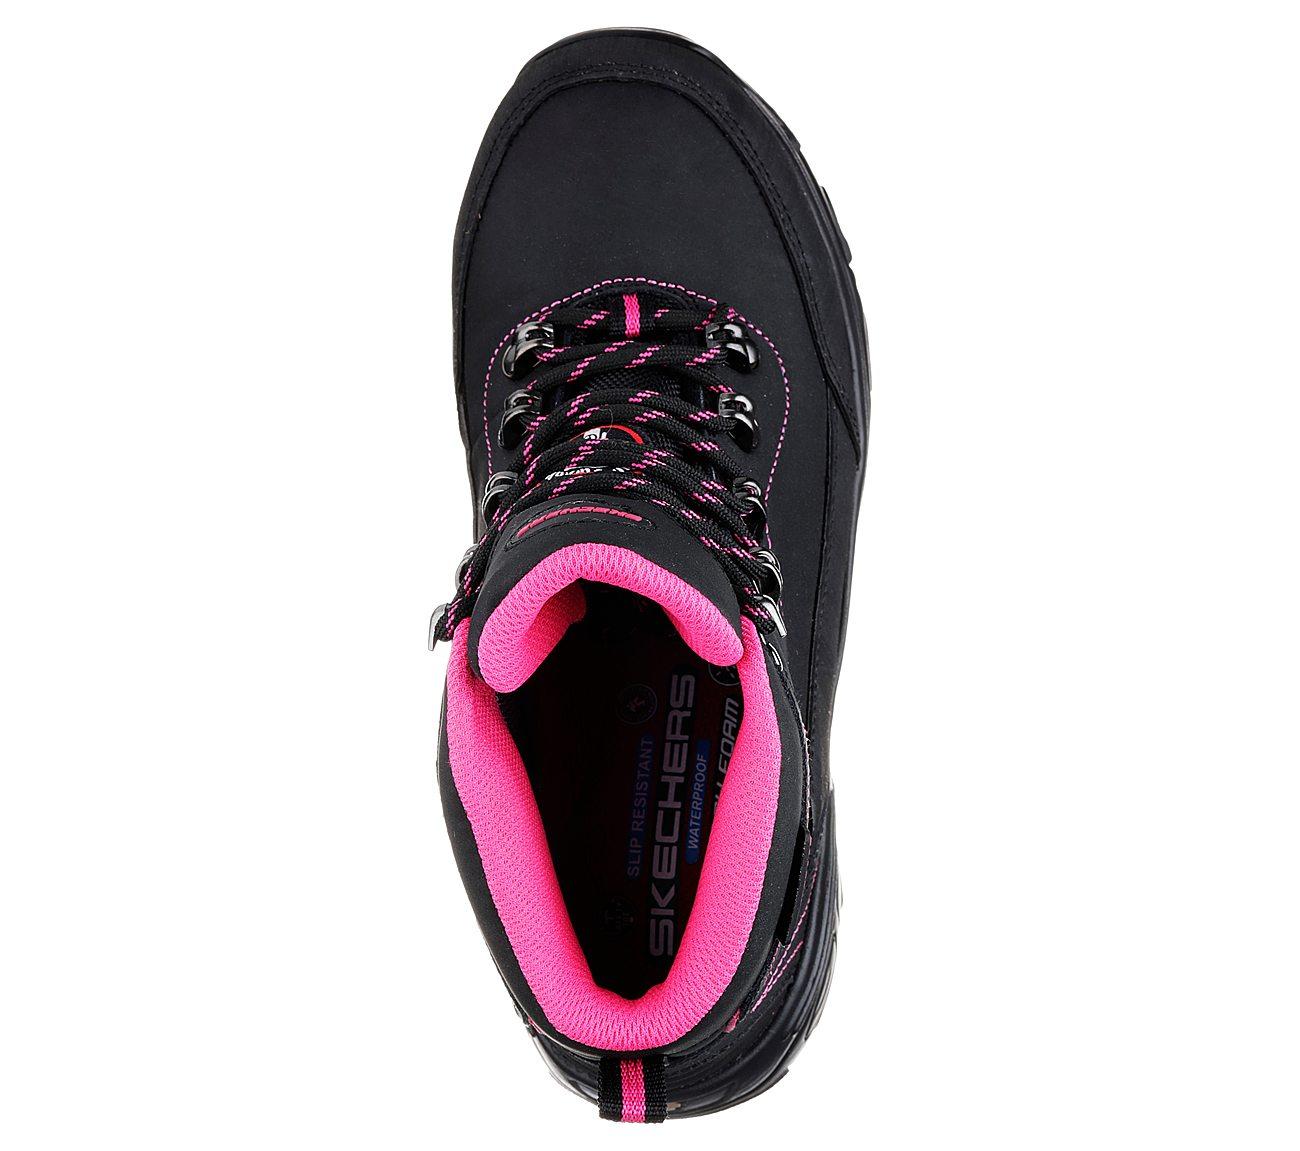 d8b172235e44 Buy SKECHERS Work  D Lites SR - Amasa Alloy Toe Work Shoes only  135.00